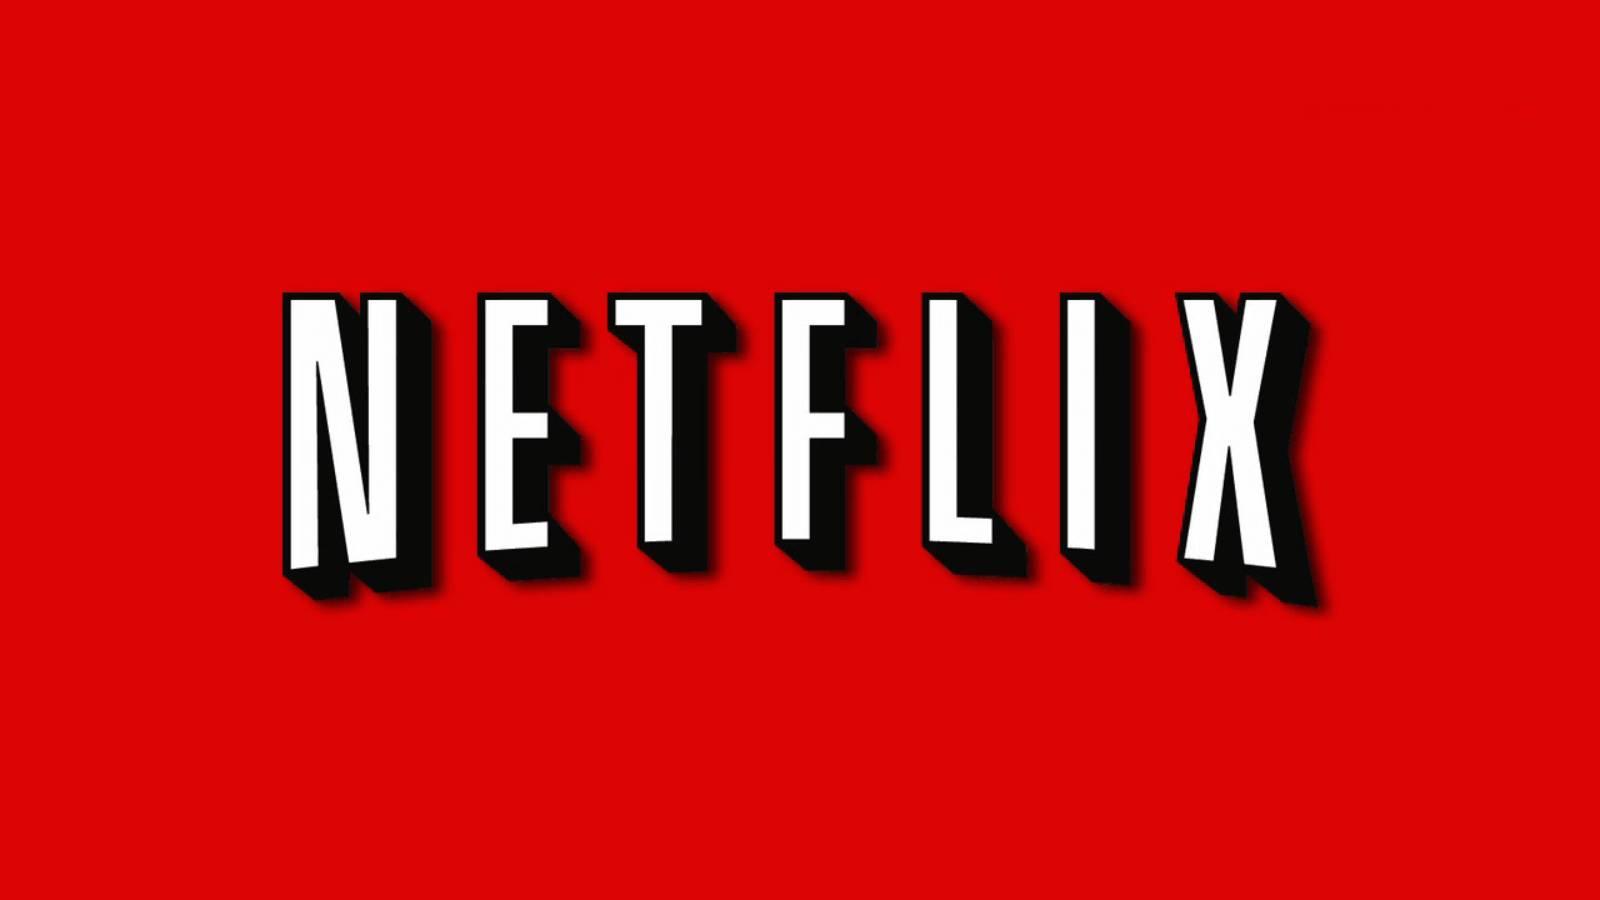 Netflix paramount